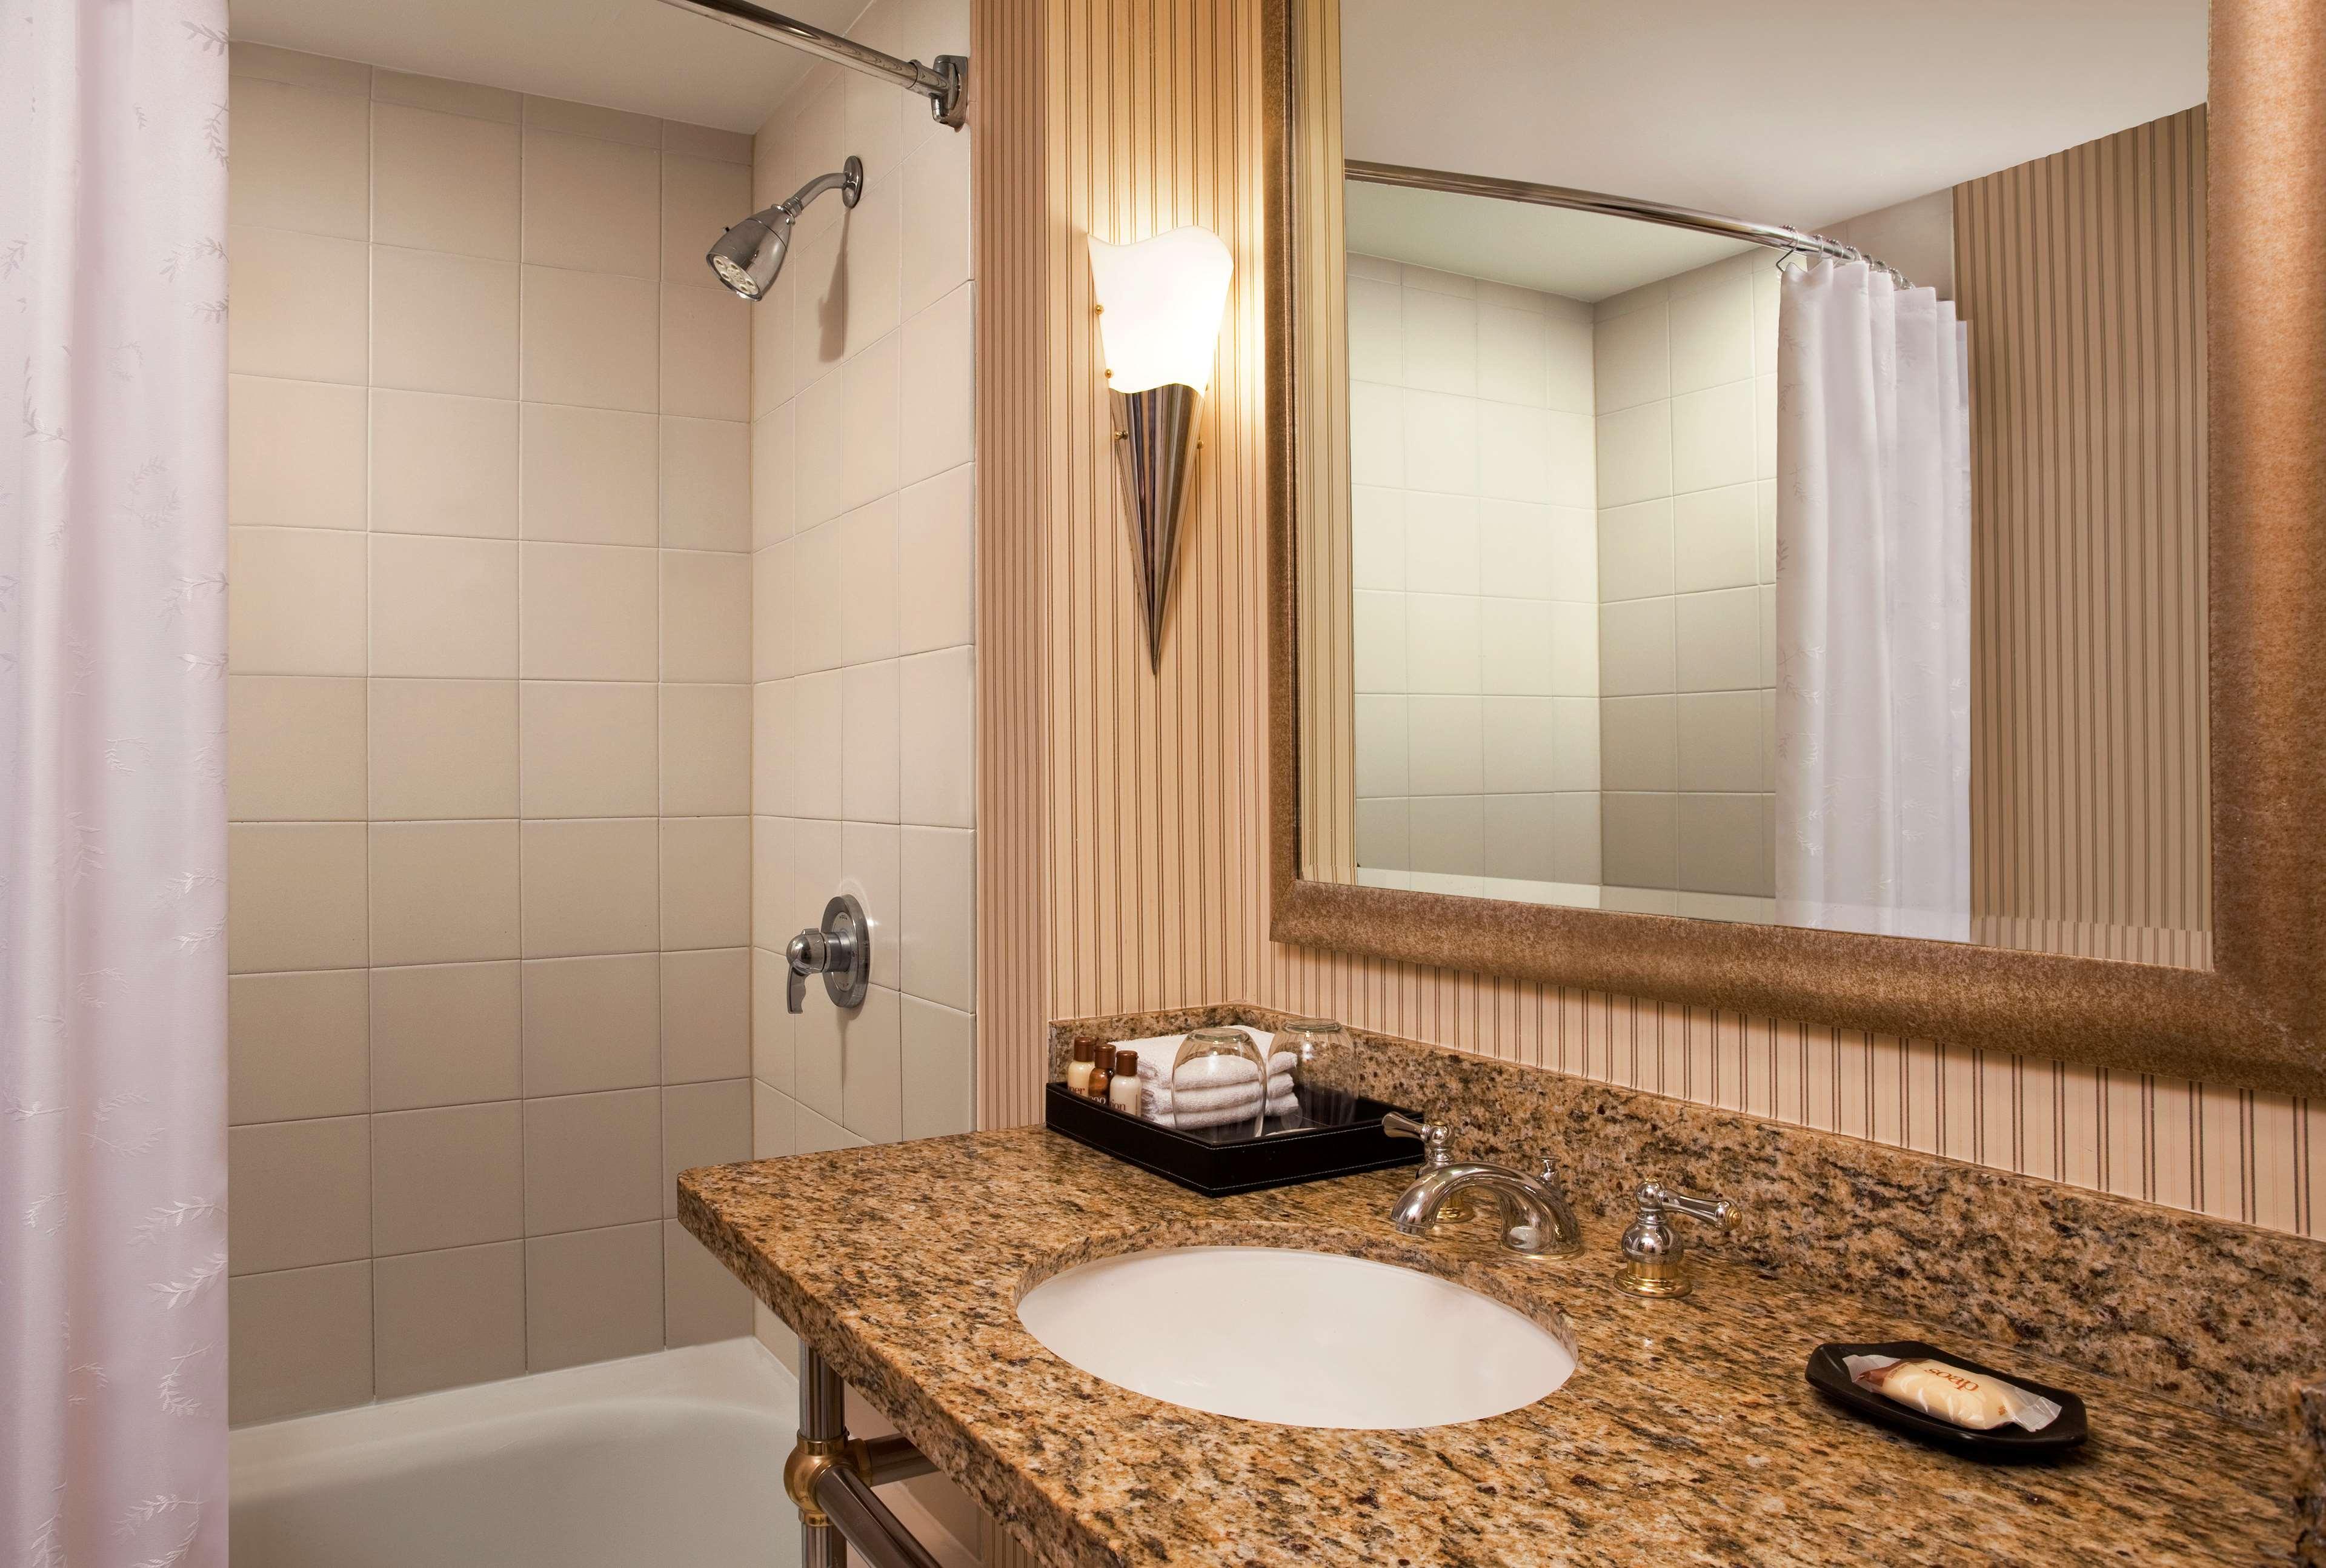 Sheraton Atlantic City Convention Center Hotel image 8